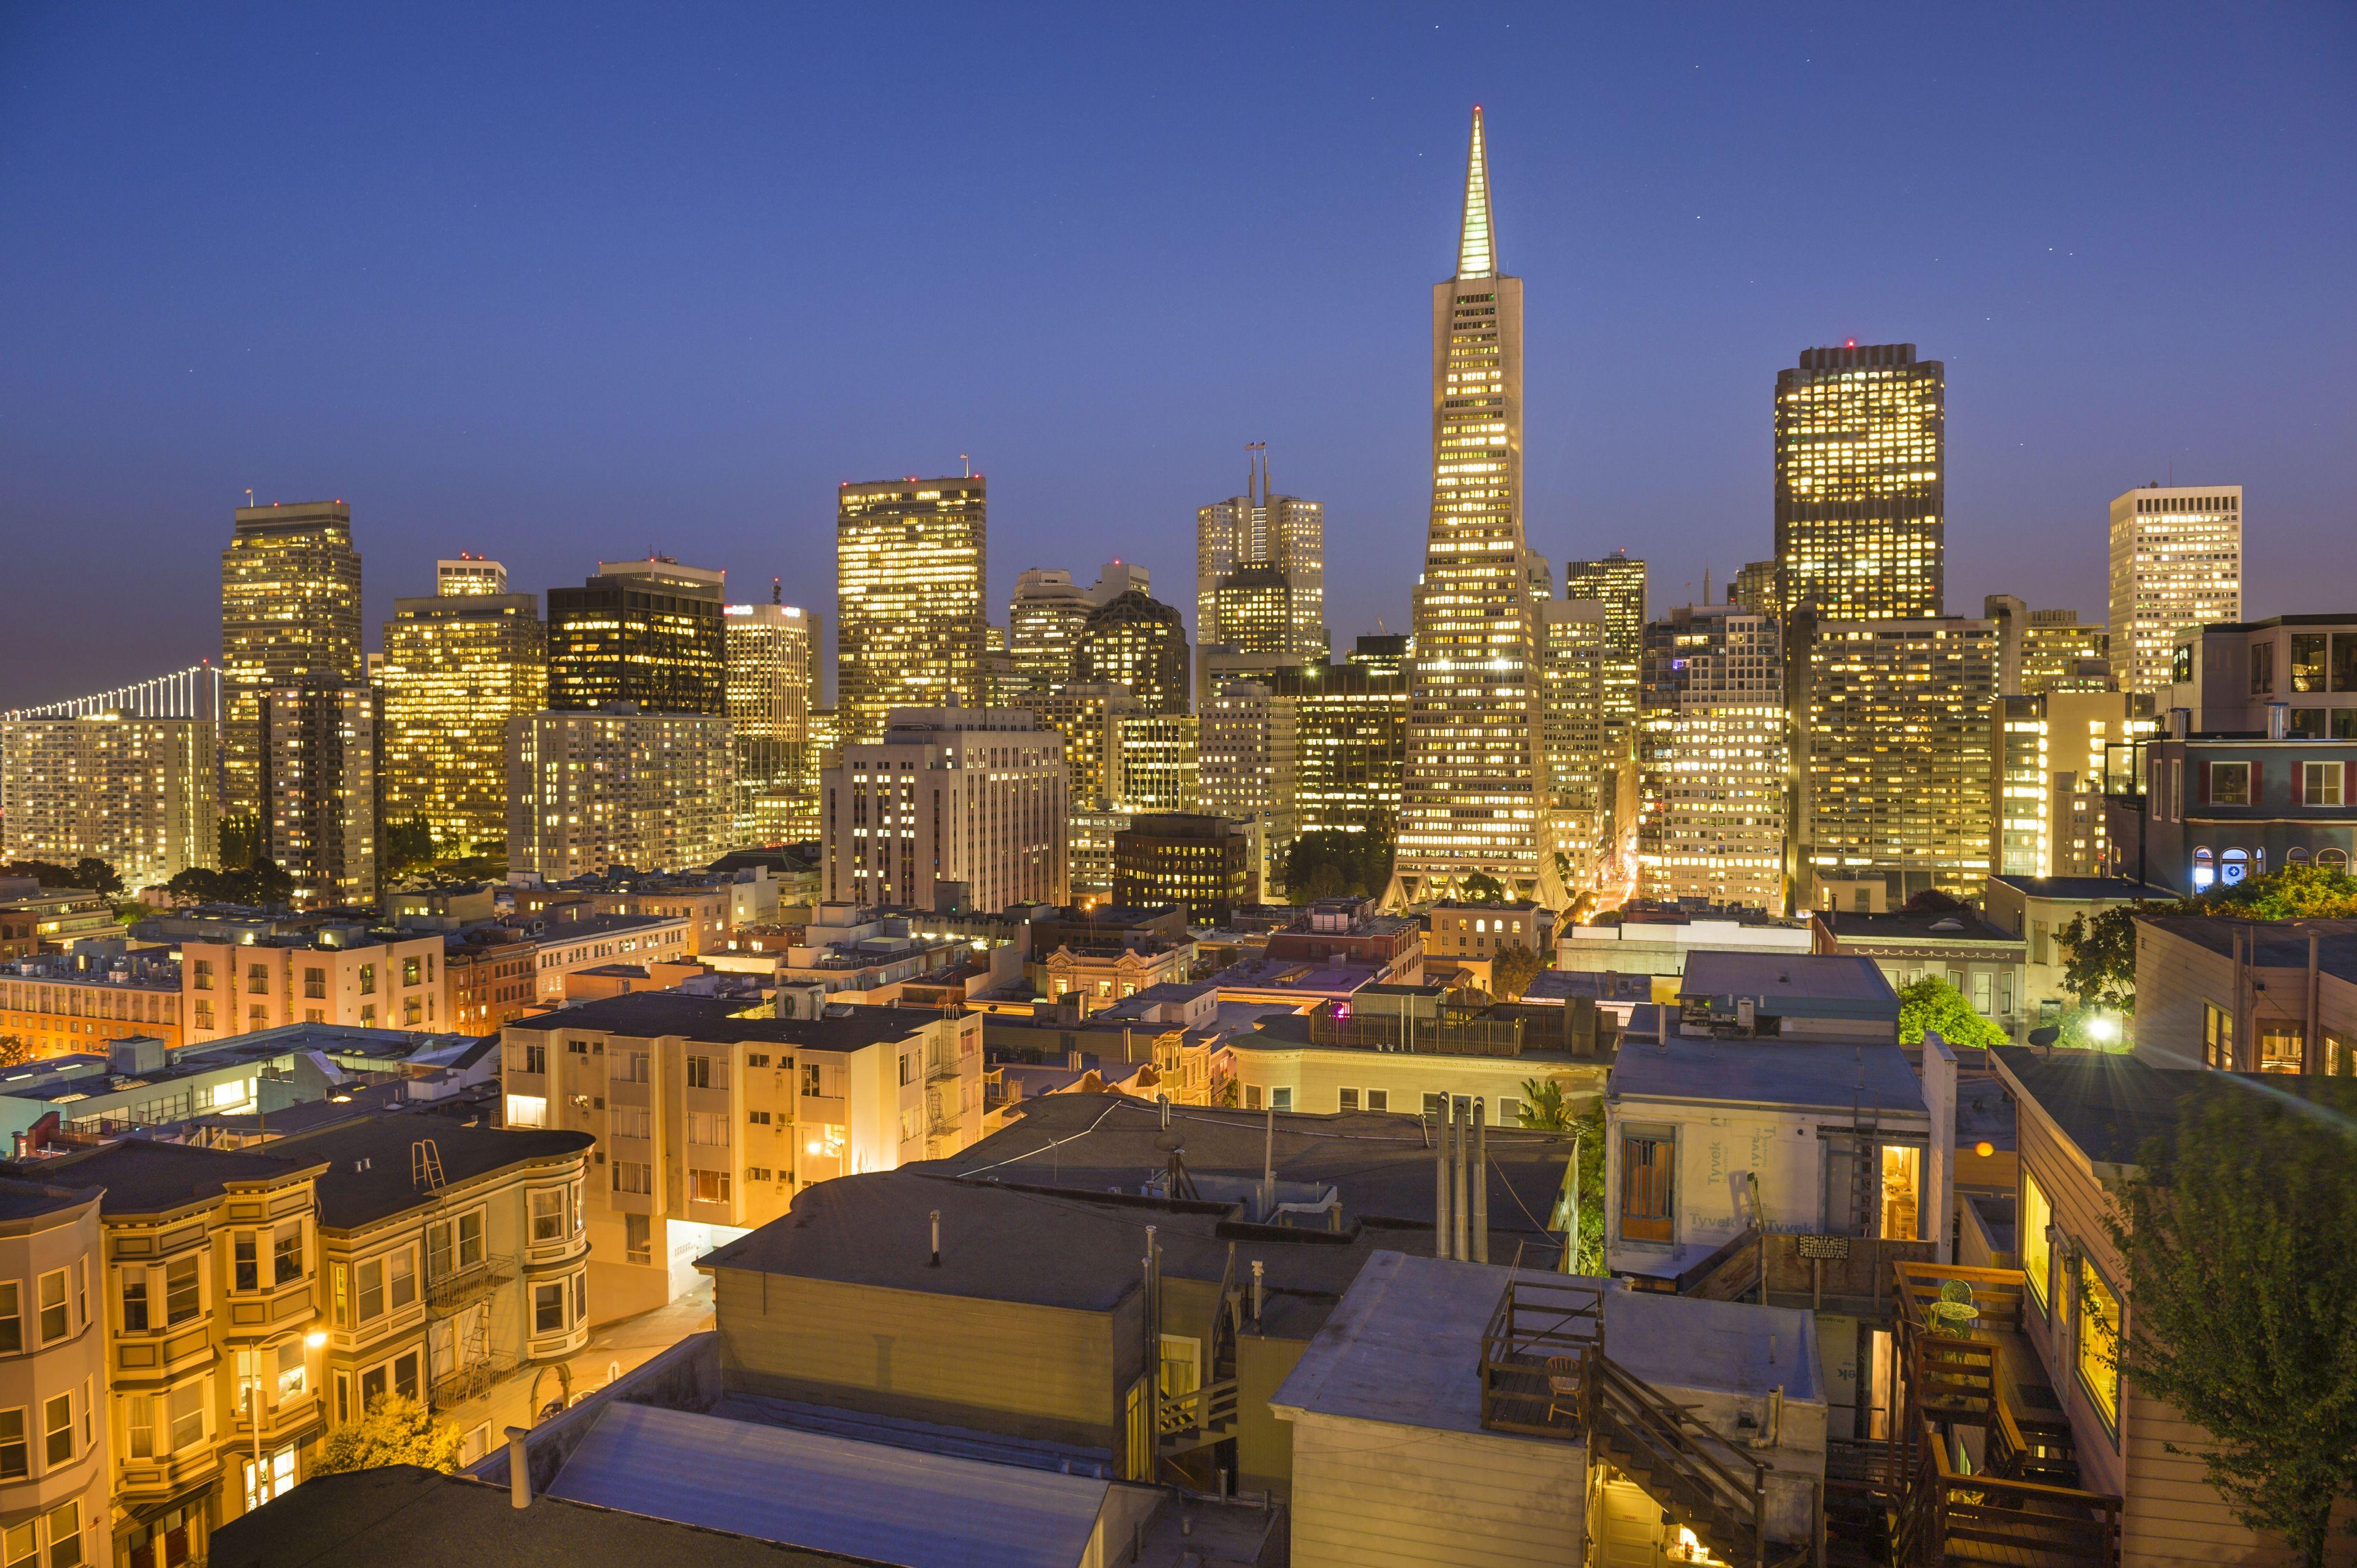 Plan a San Francisco Trip - Use These 12 Easy Steps